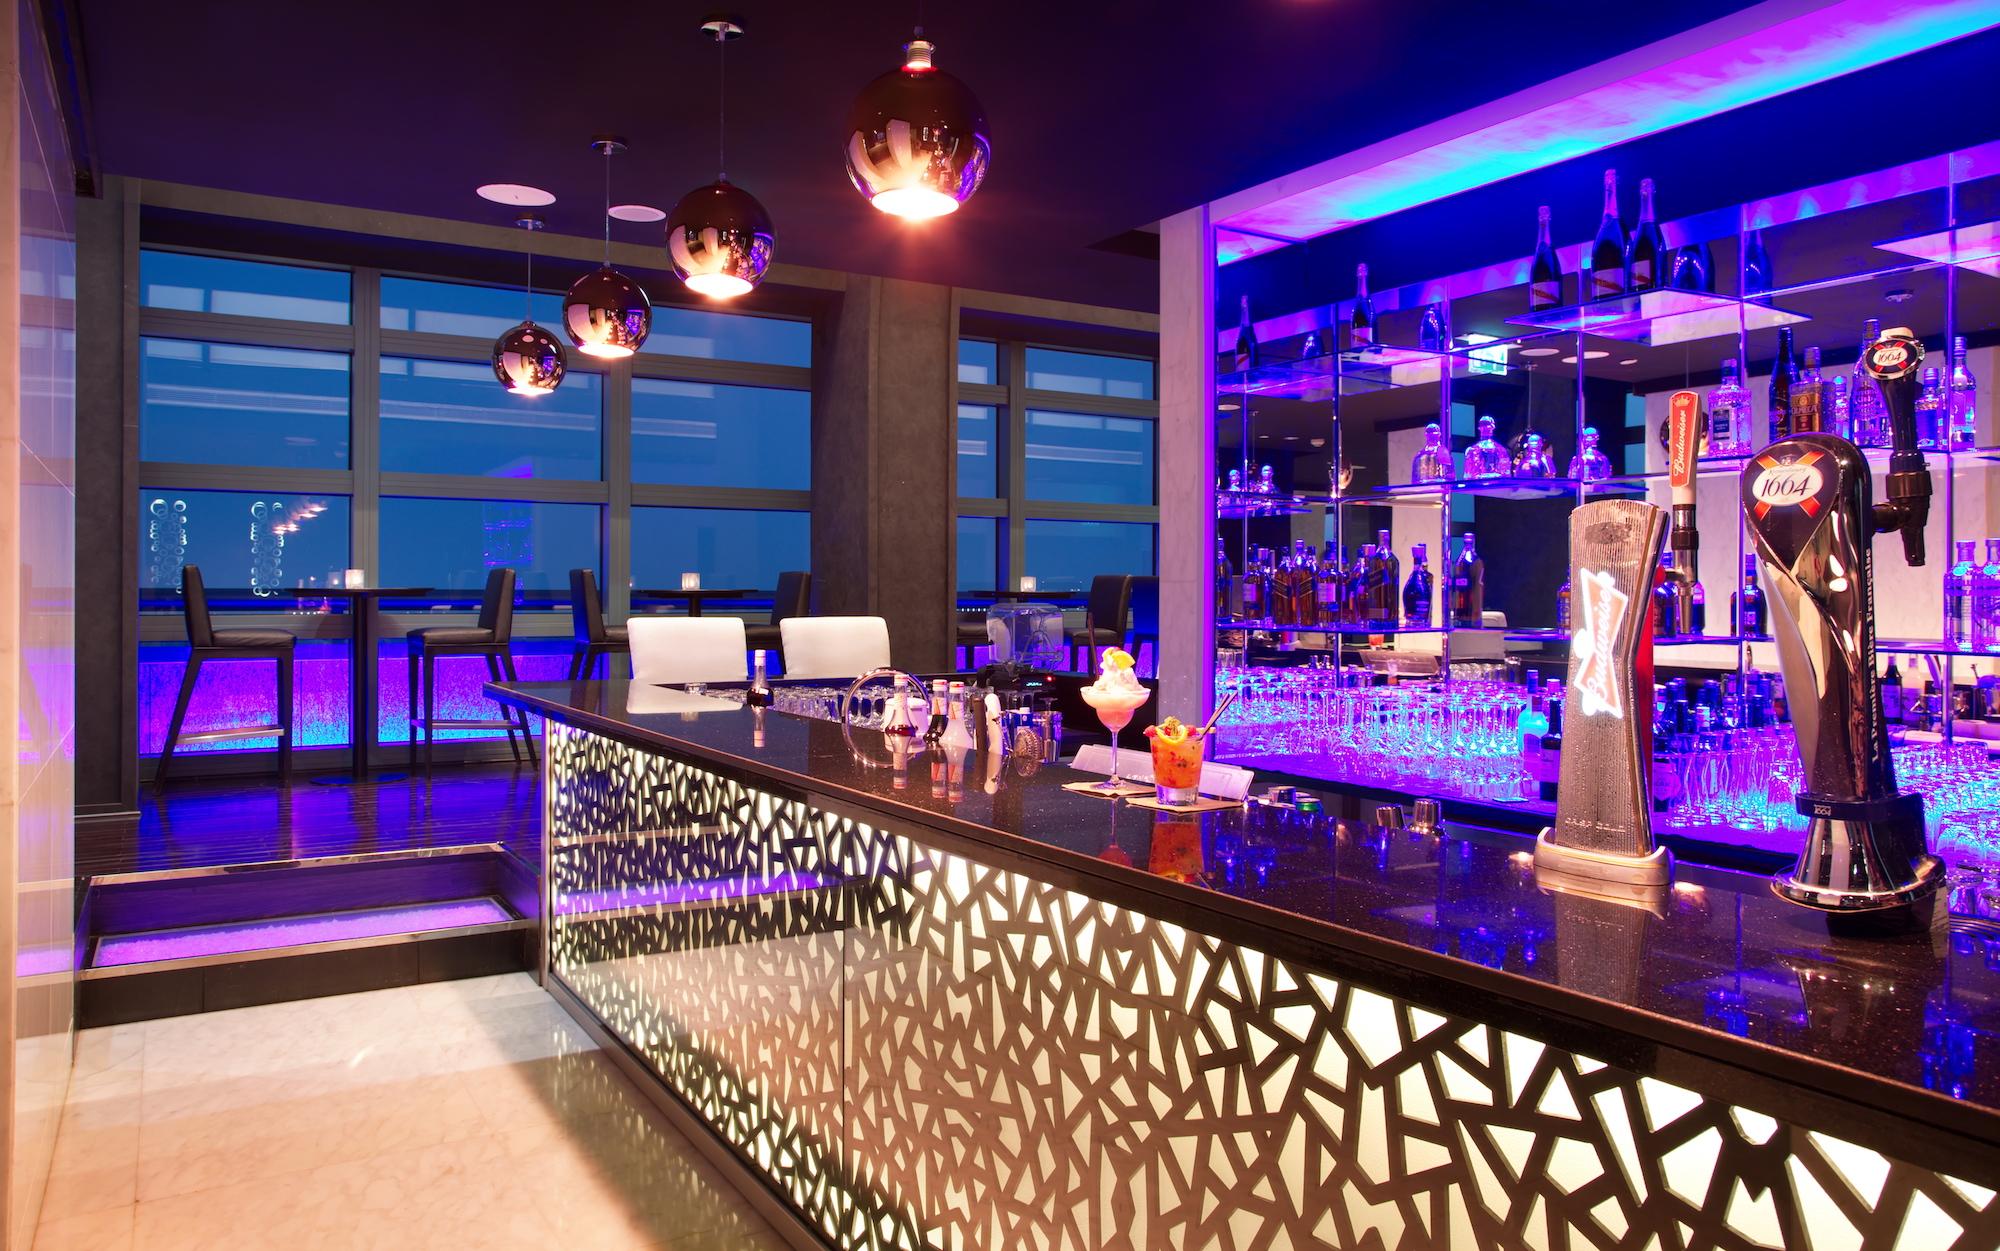 Blue Sky Cafe And Juice Bar